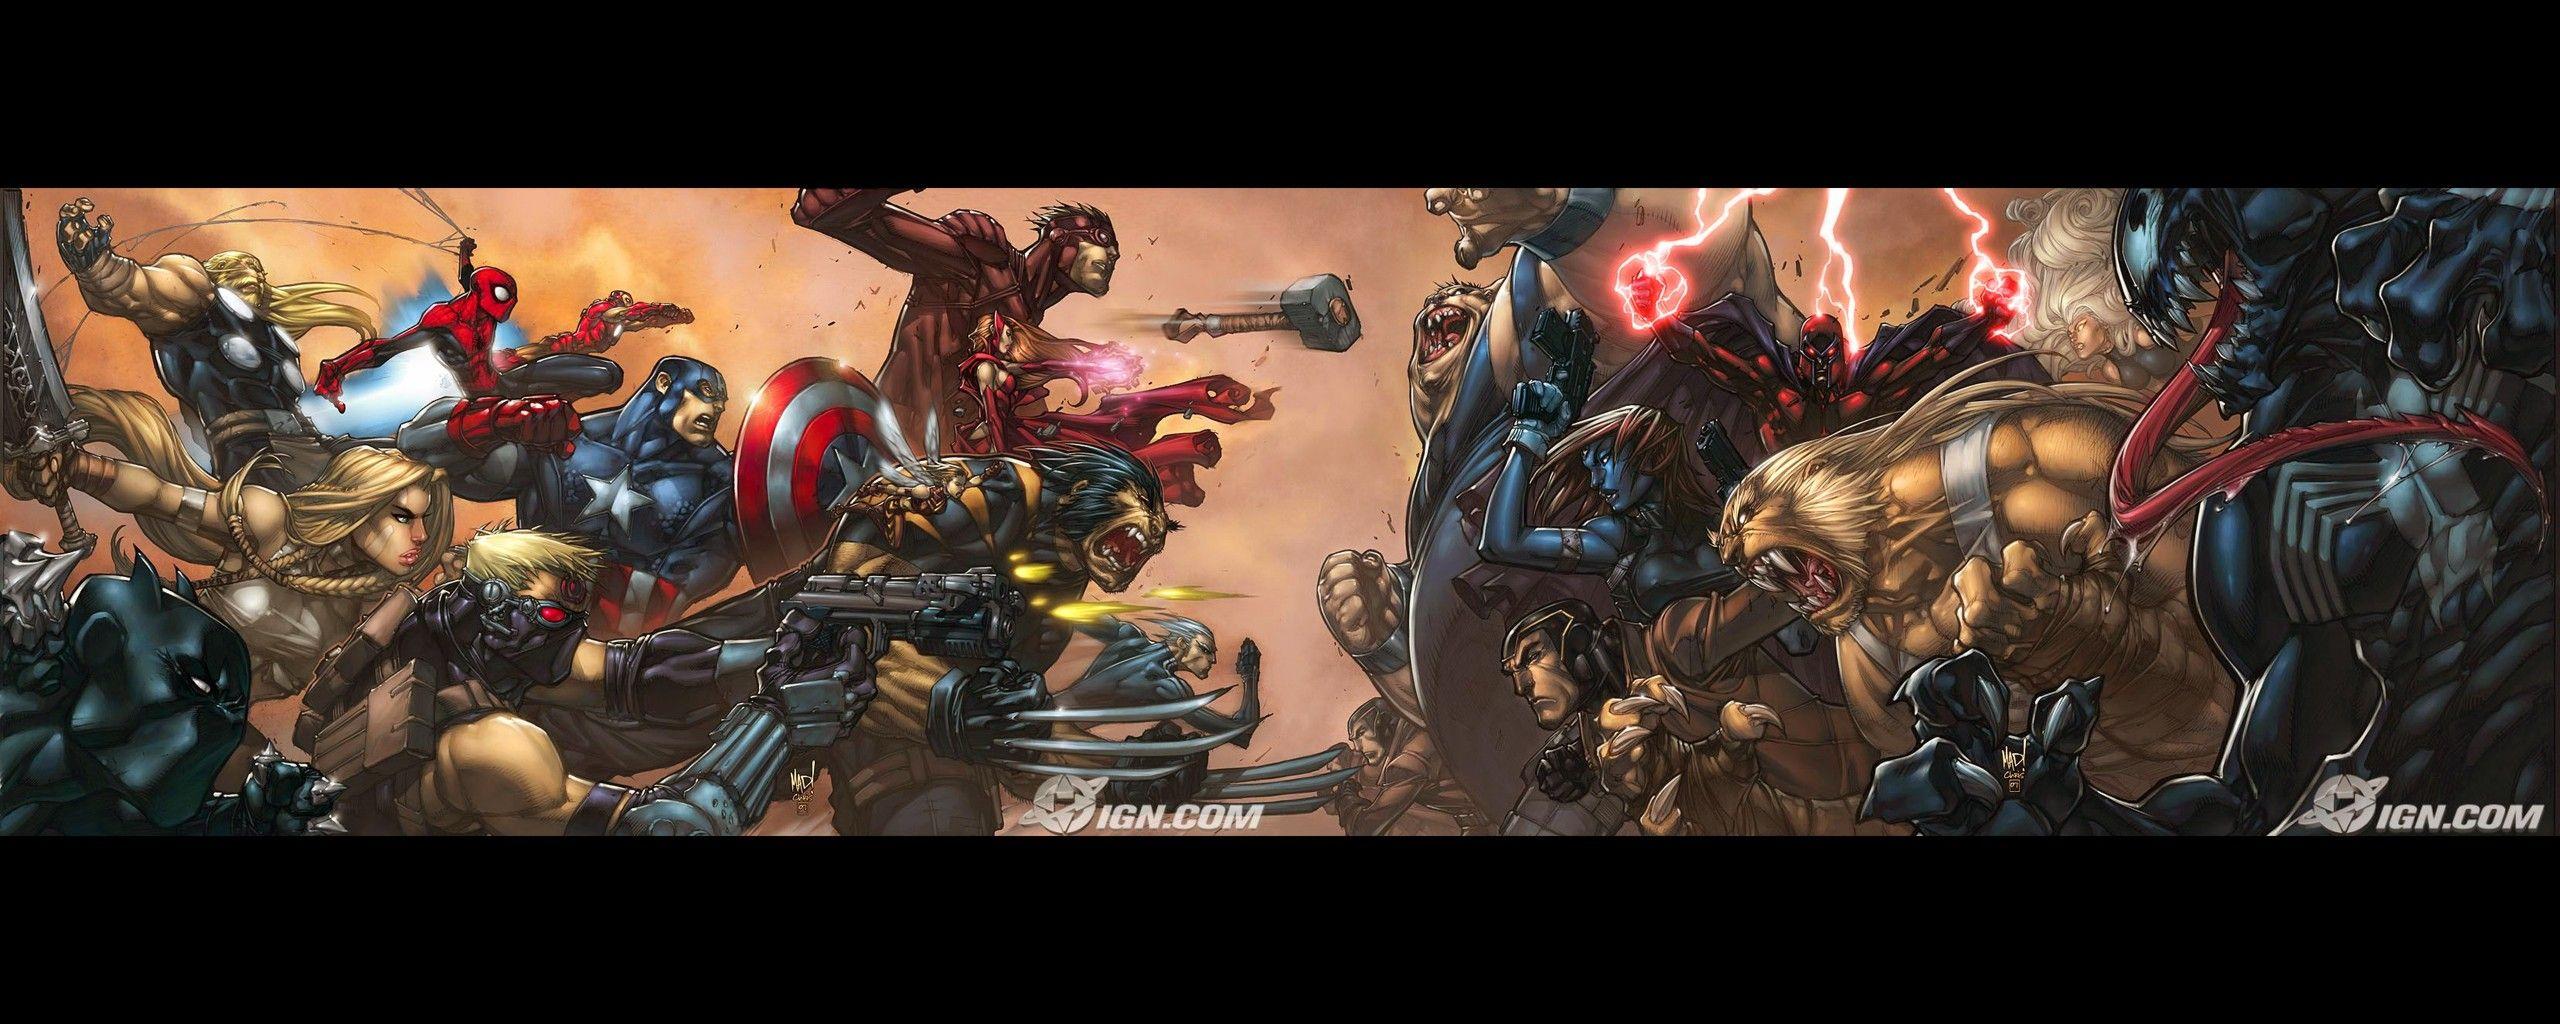 Venom Vs Wolverine Tattoo Dedbaccdefbafc